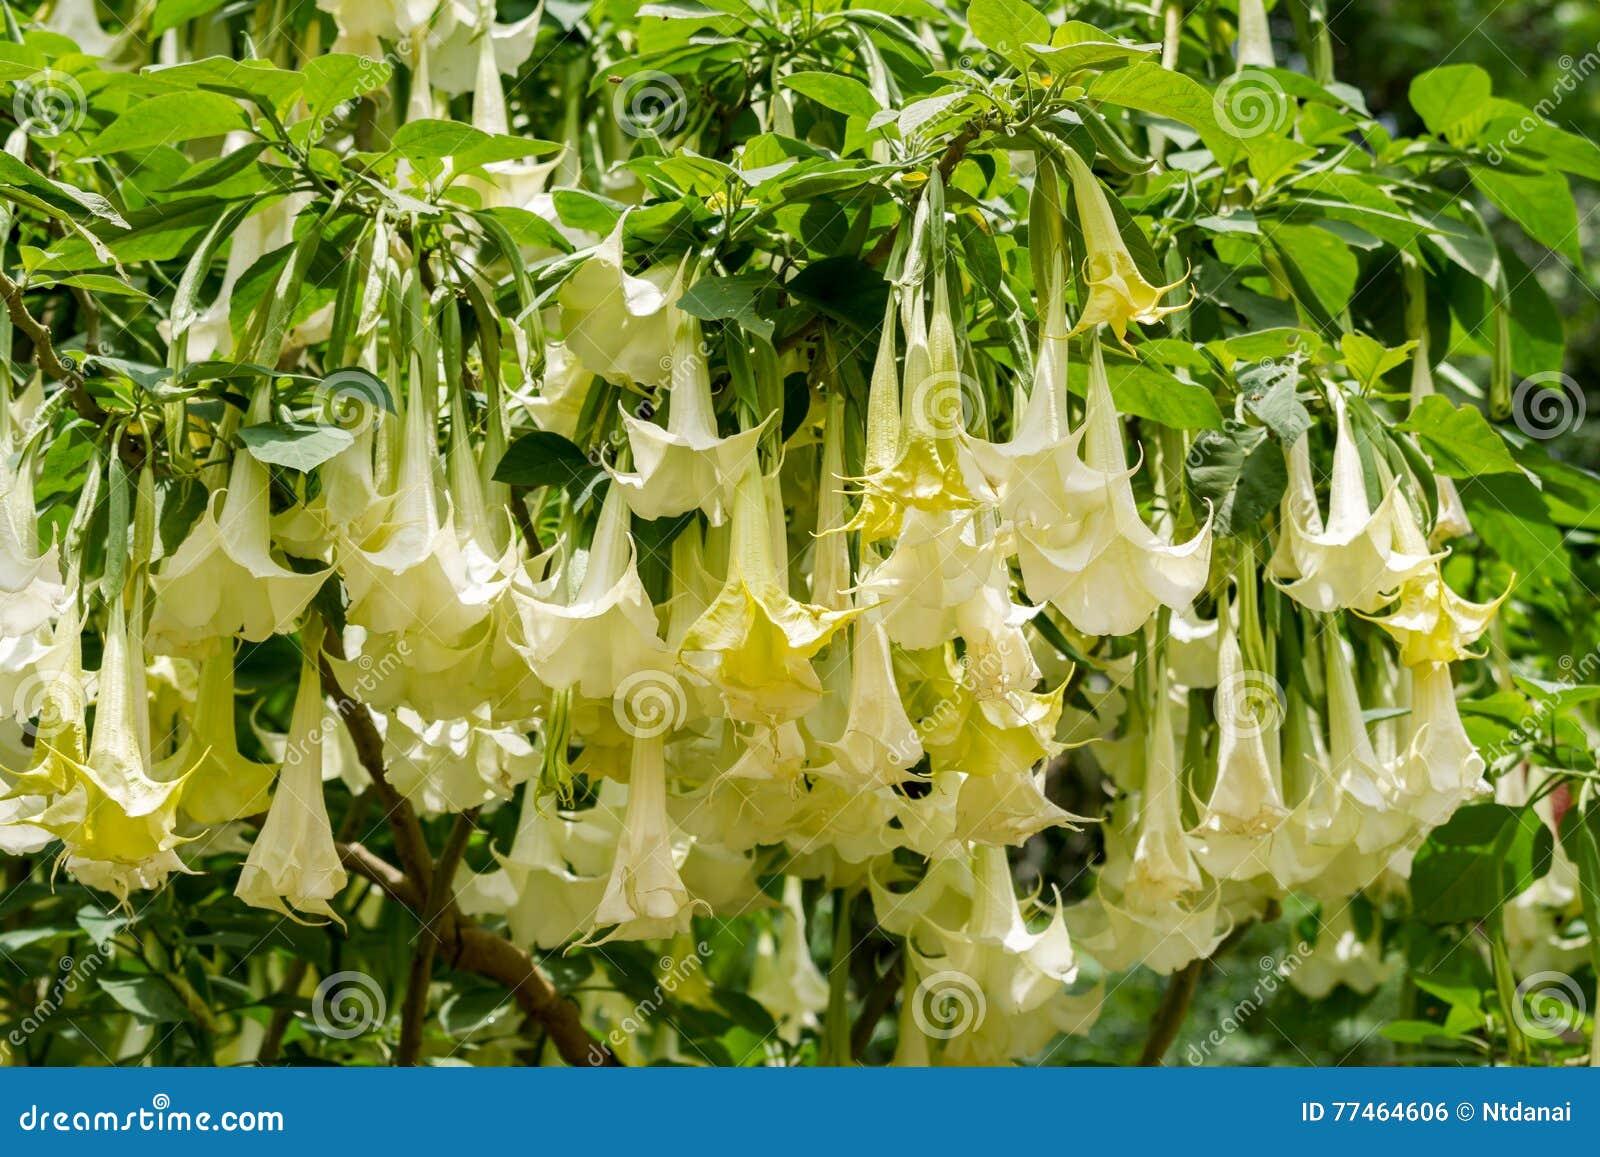 White Datura Flower Stock Photo Image Of Poisonous Nobody 77464606